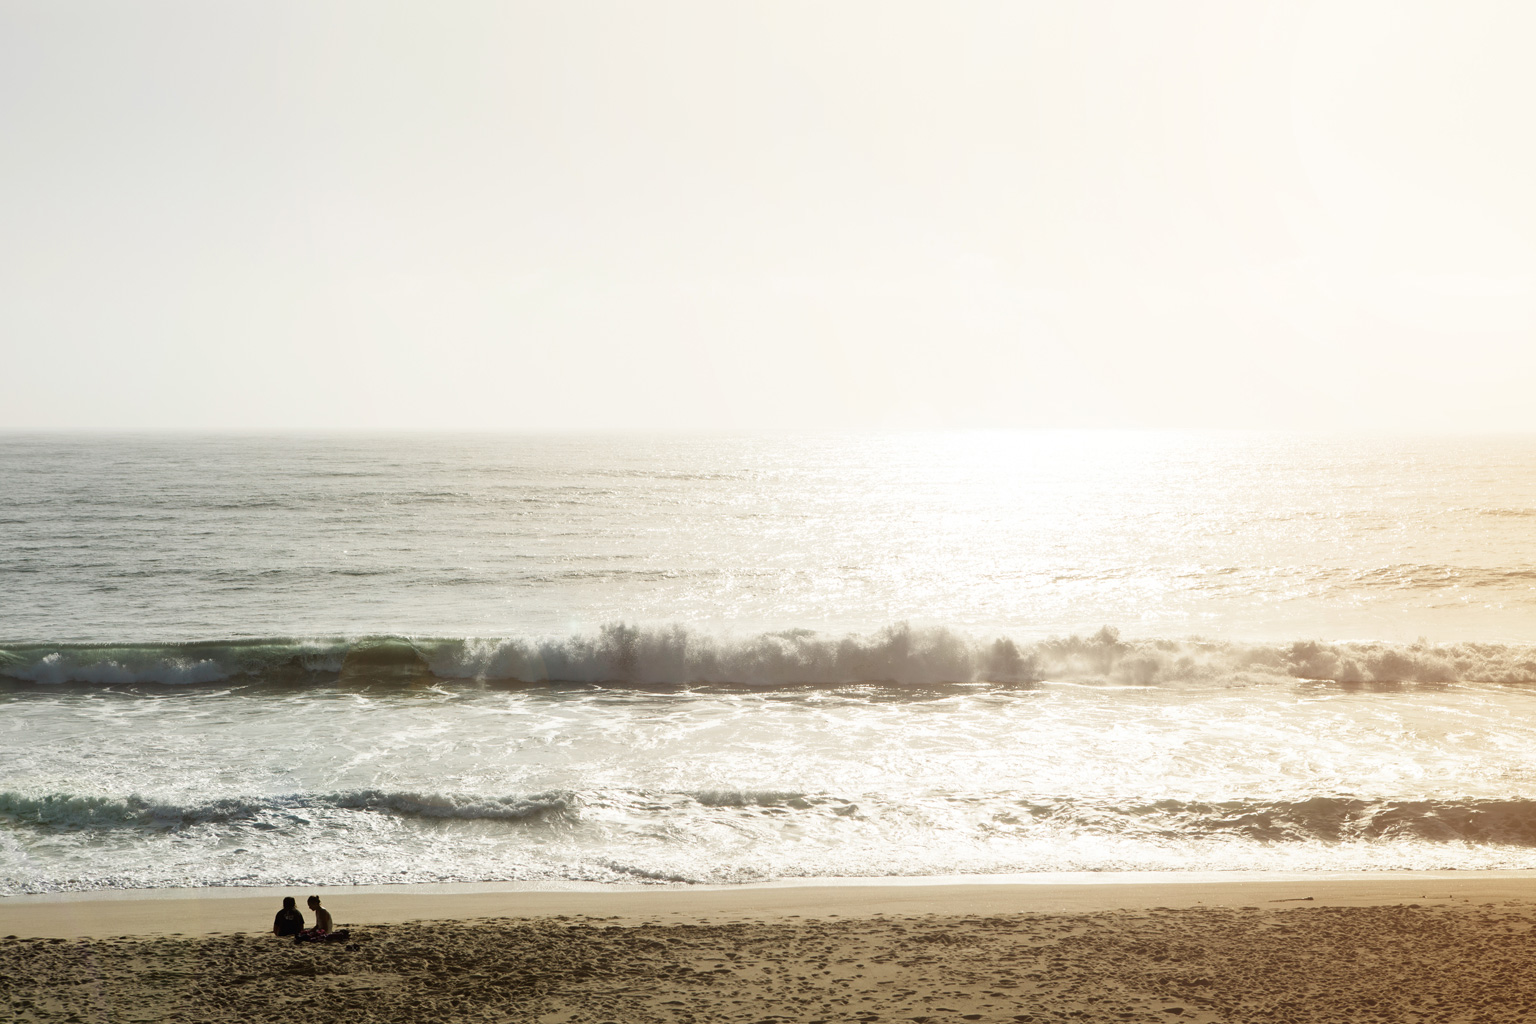 CindyGiovagnoli_SantCruz_SanJose_SanFrancisco_NelderGrove_sea_lions_boardwalk_hapas_brewery_sourdough_ocean_half_moon_bay_California-063.jpg